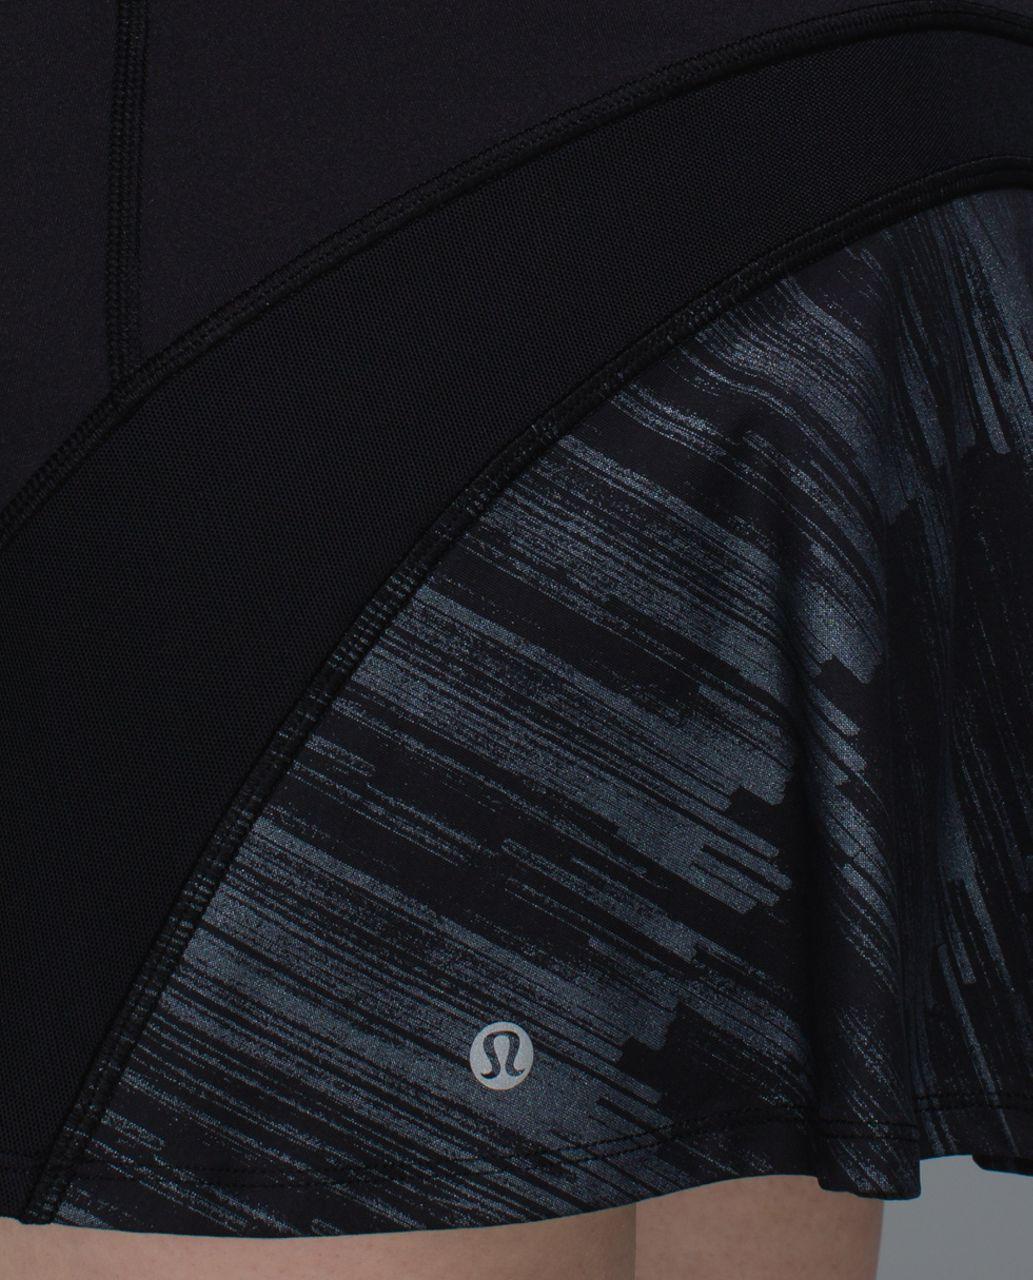 23dcfe9ba Lululemon Ace Skirt - Black / Scratch Match Black Multi - lulu fanatics